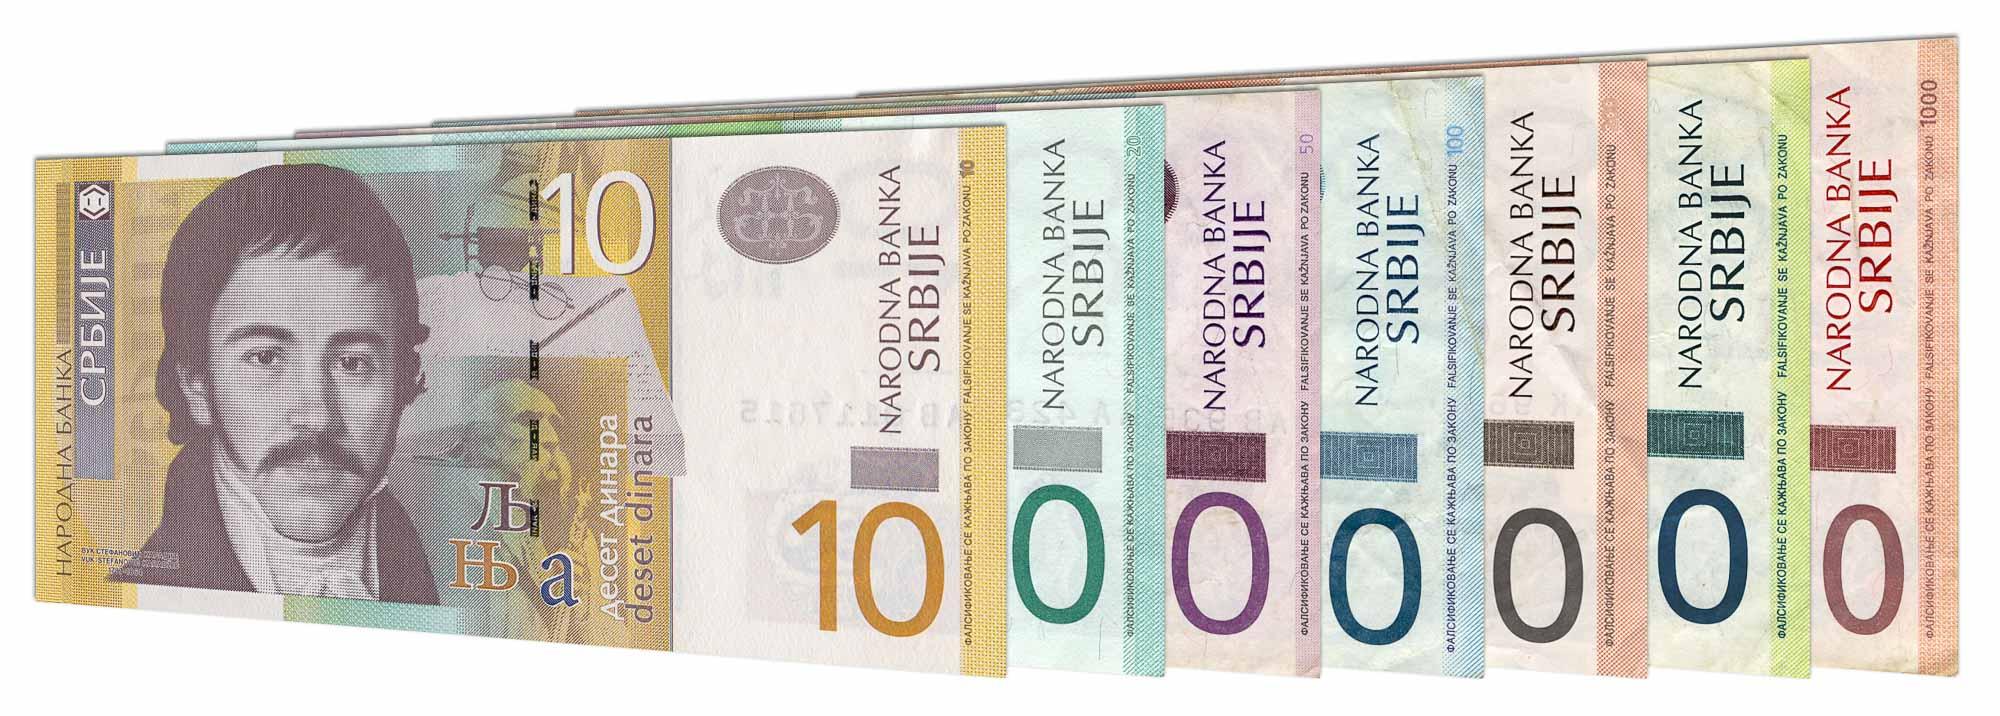 Serbian Dinars Online Rsd Home